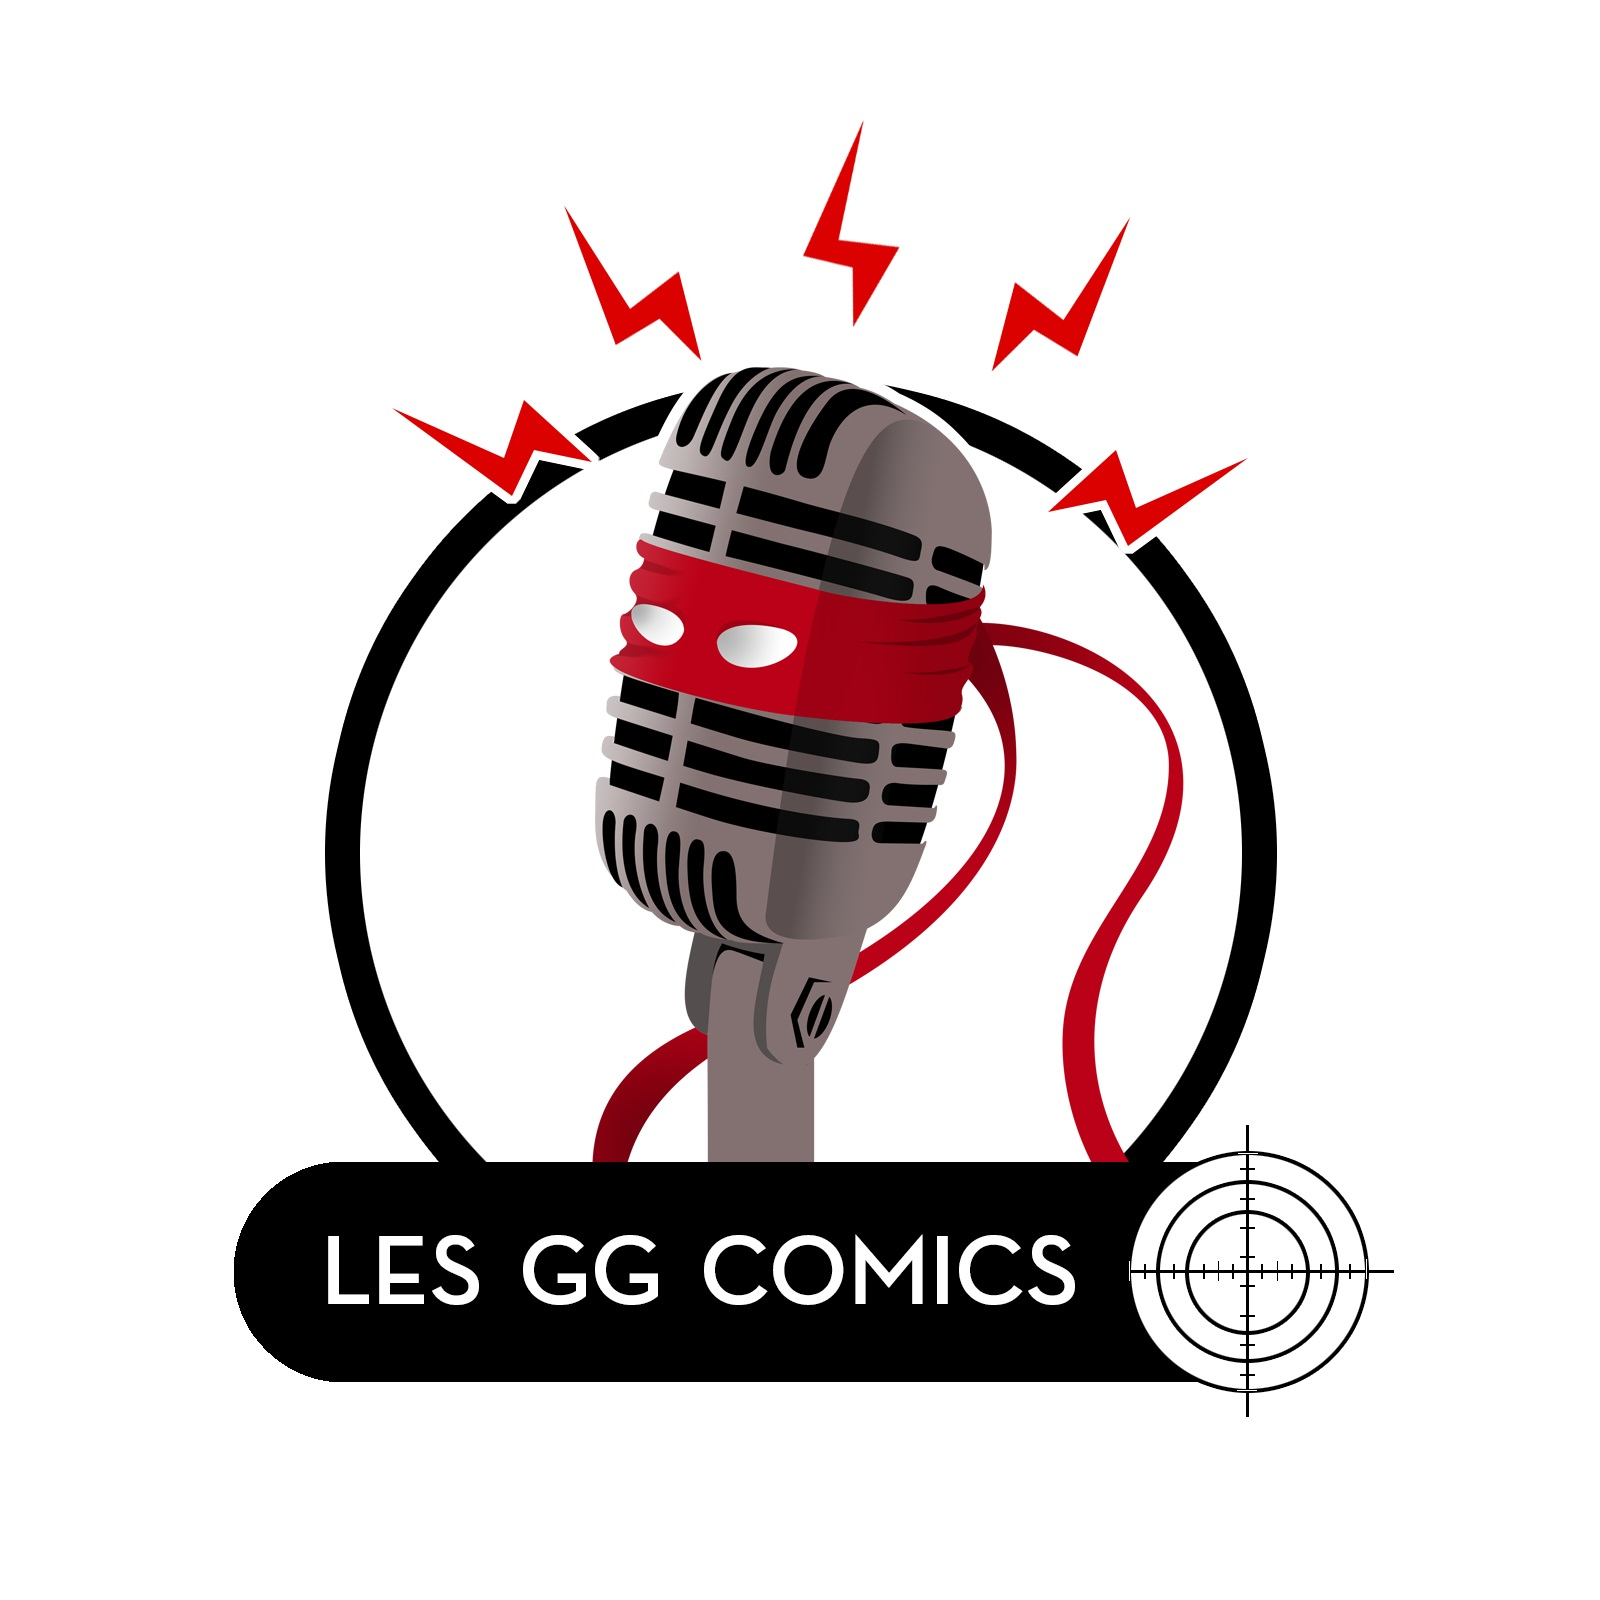 Les GG comics #050 : Si j'étais scénariste…